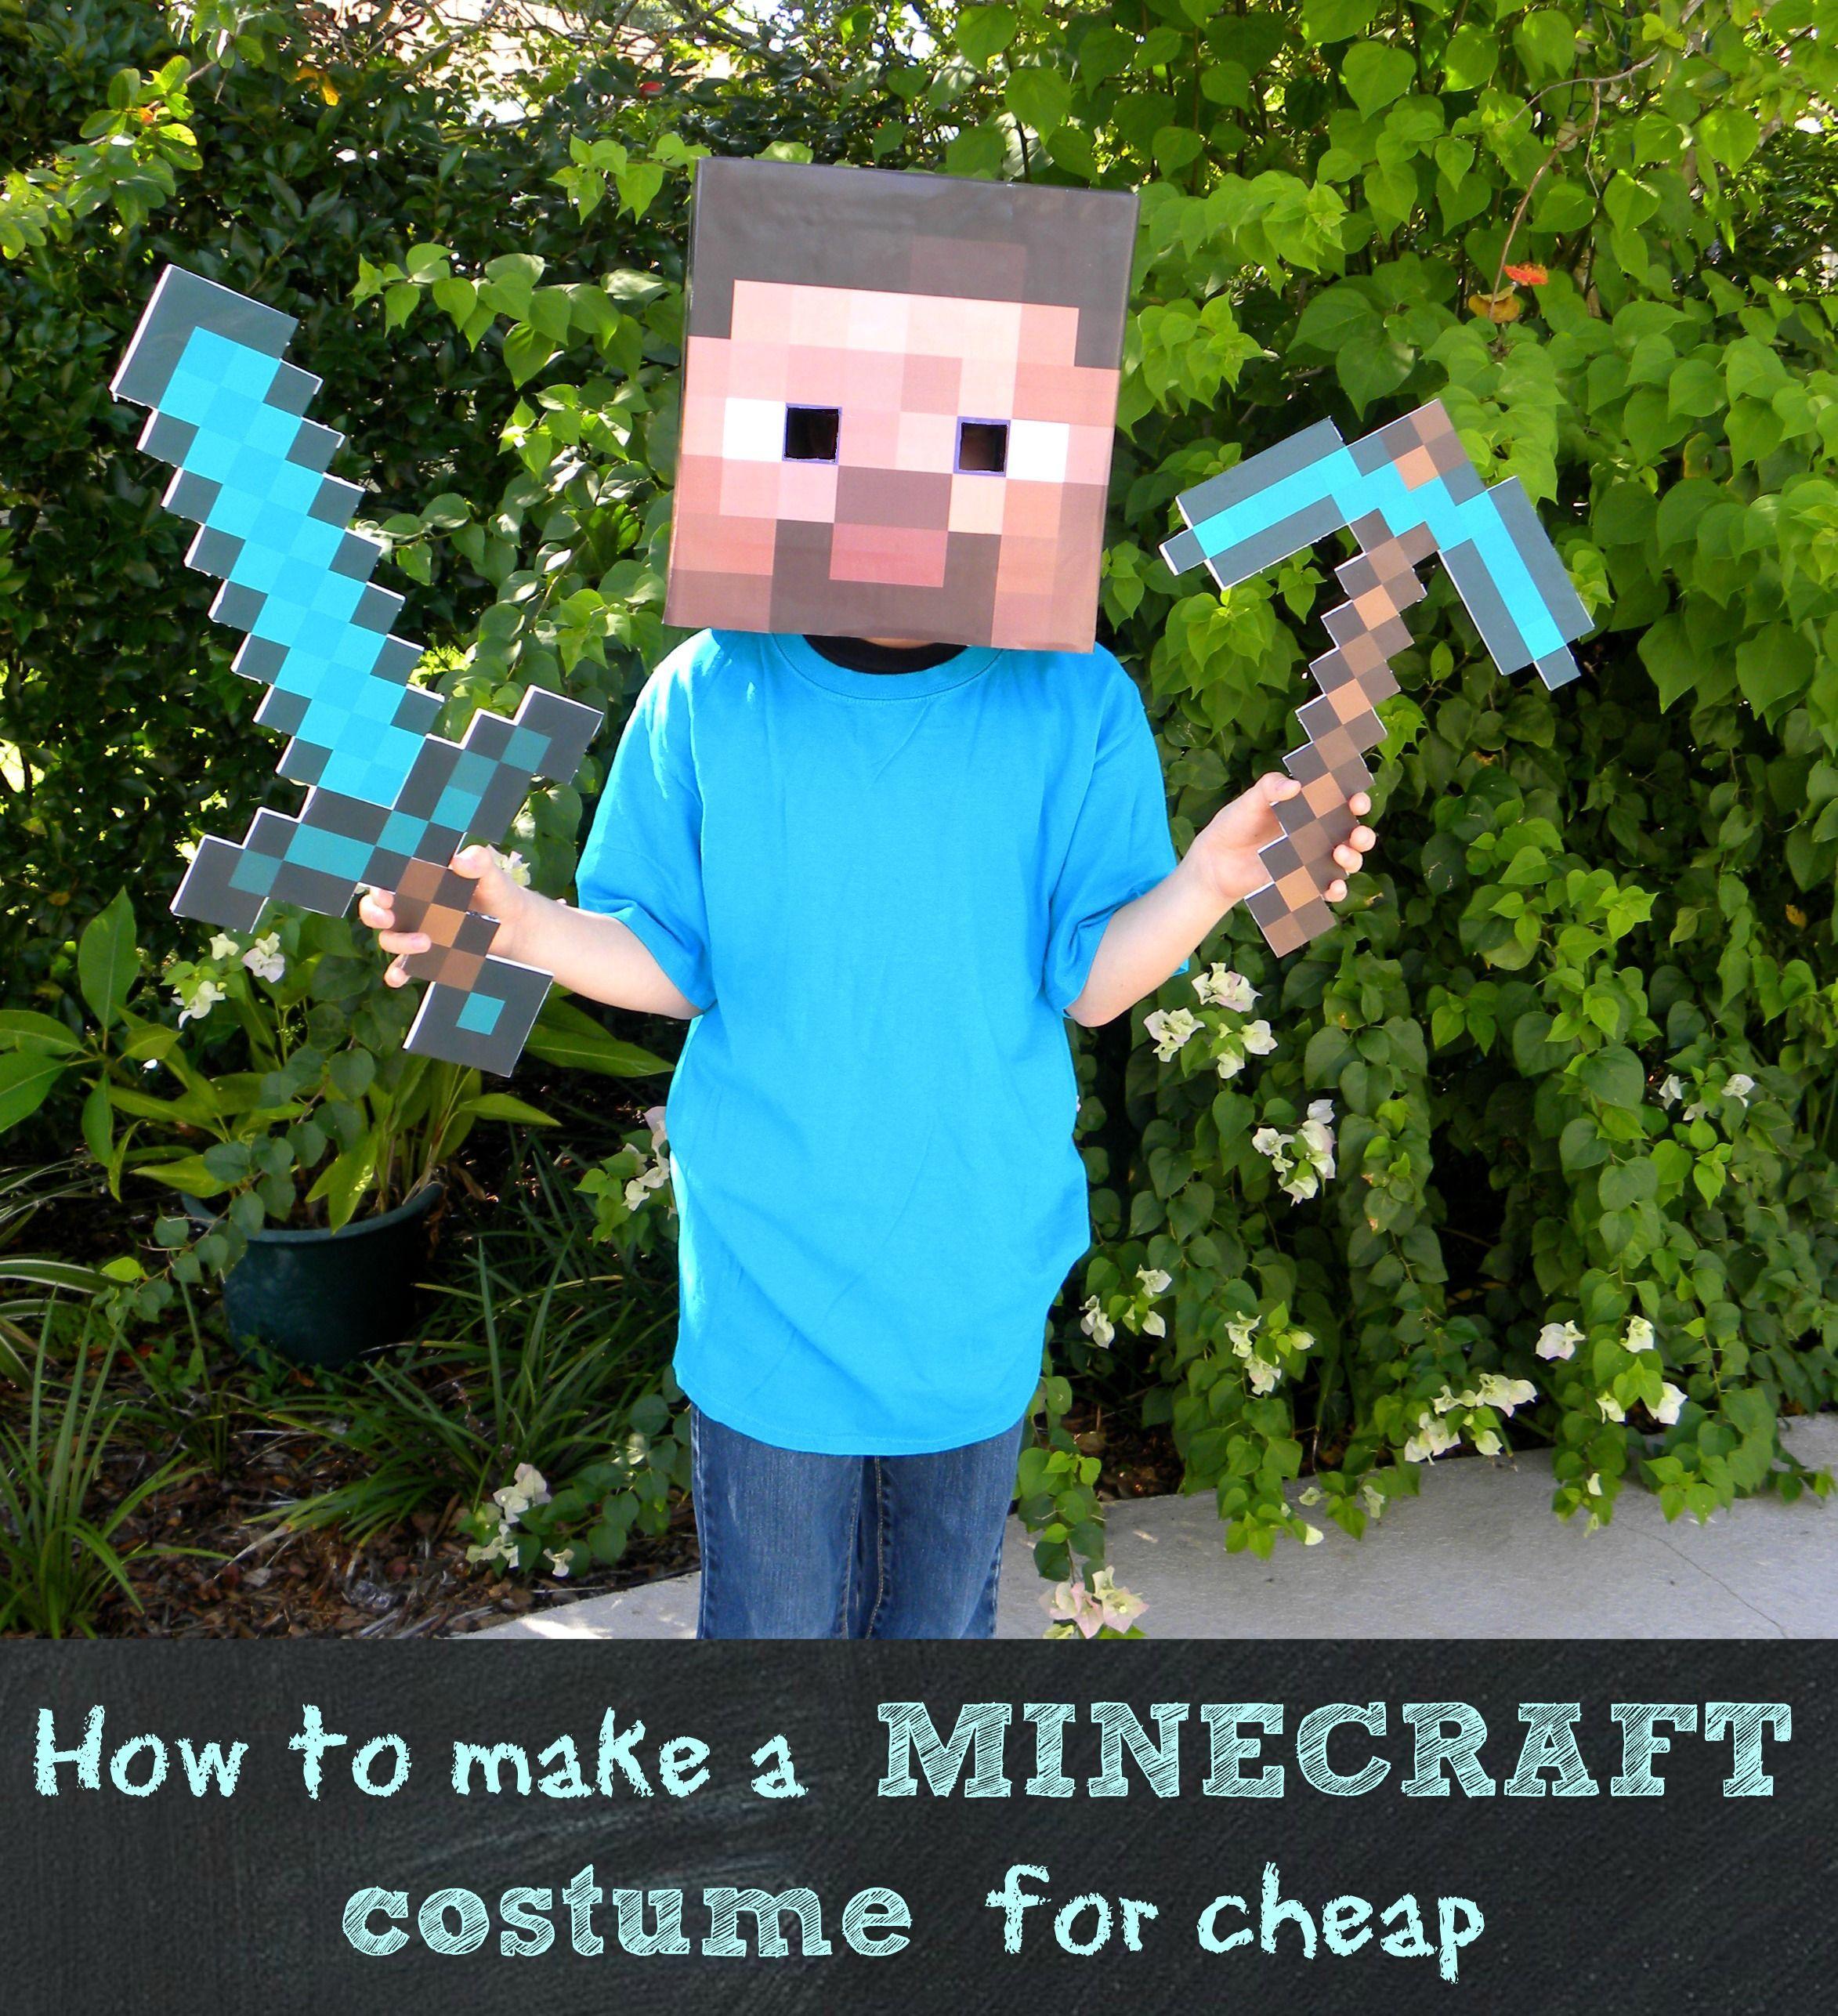 Kerryannmorgancom Minecraft Costume Steve Make Easy Head How Via To Anhow To Make An Ea Minecraft Costumes Minecraft Halloween Costume Steve Costume